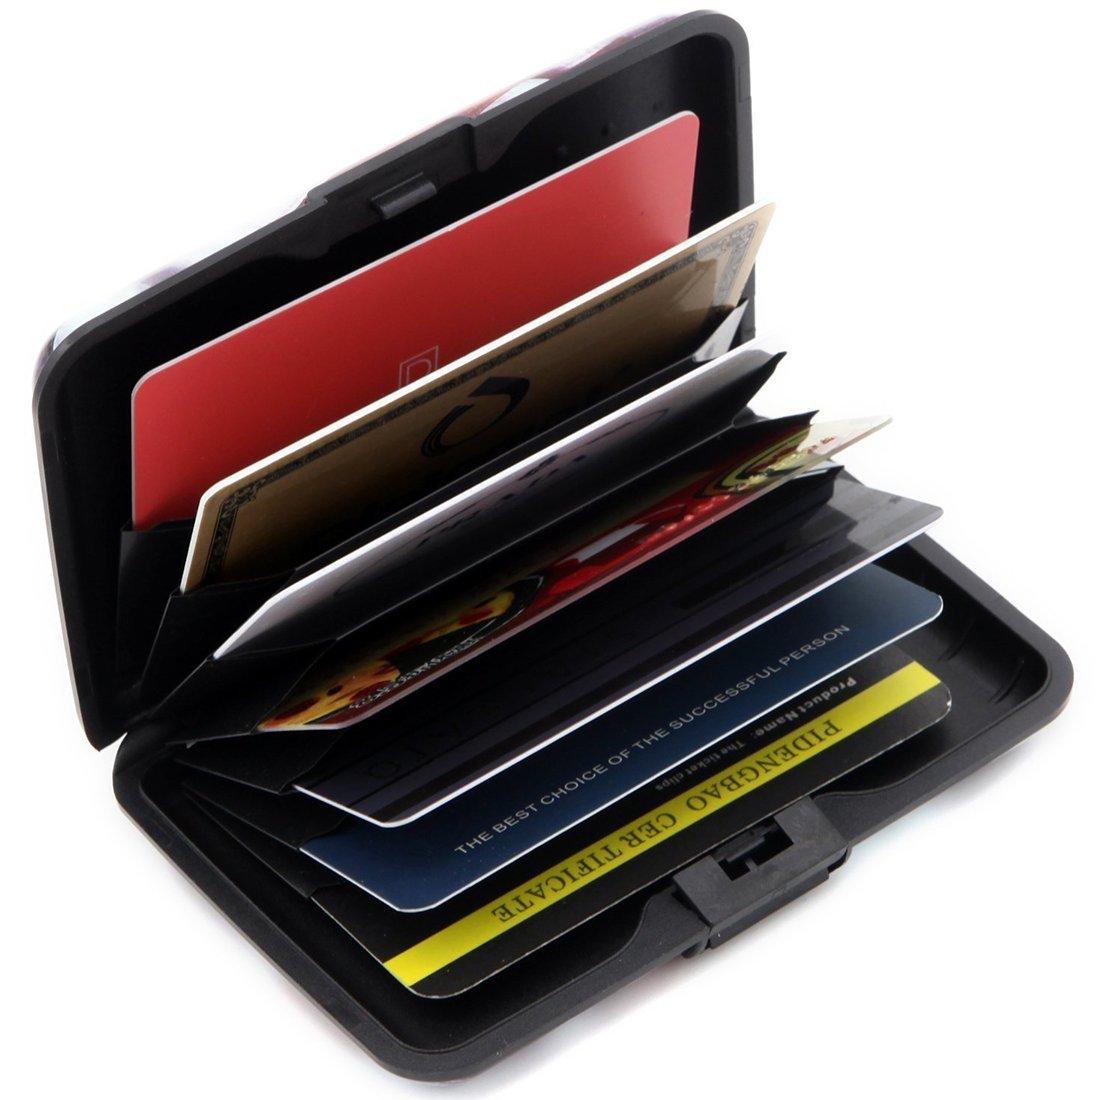 Latest Aluminum RFID Blocking Credit Card Holder for Men & Women ...